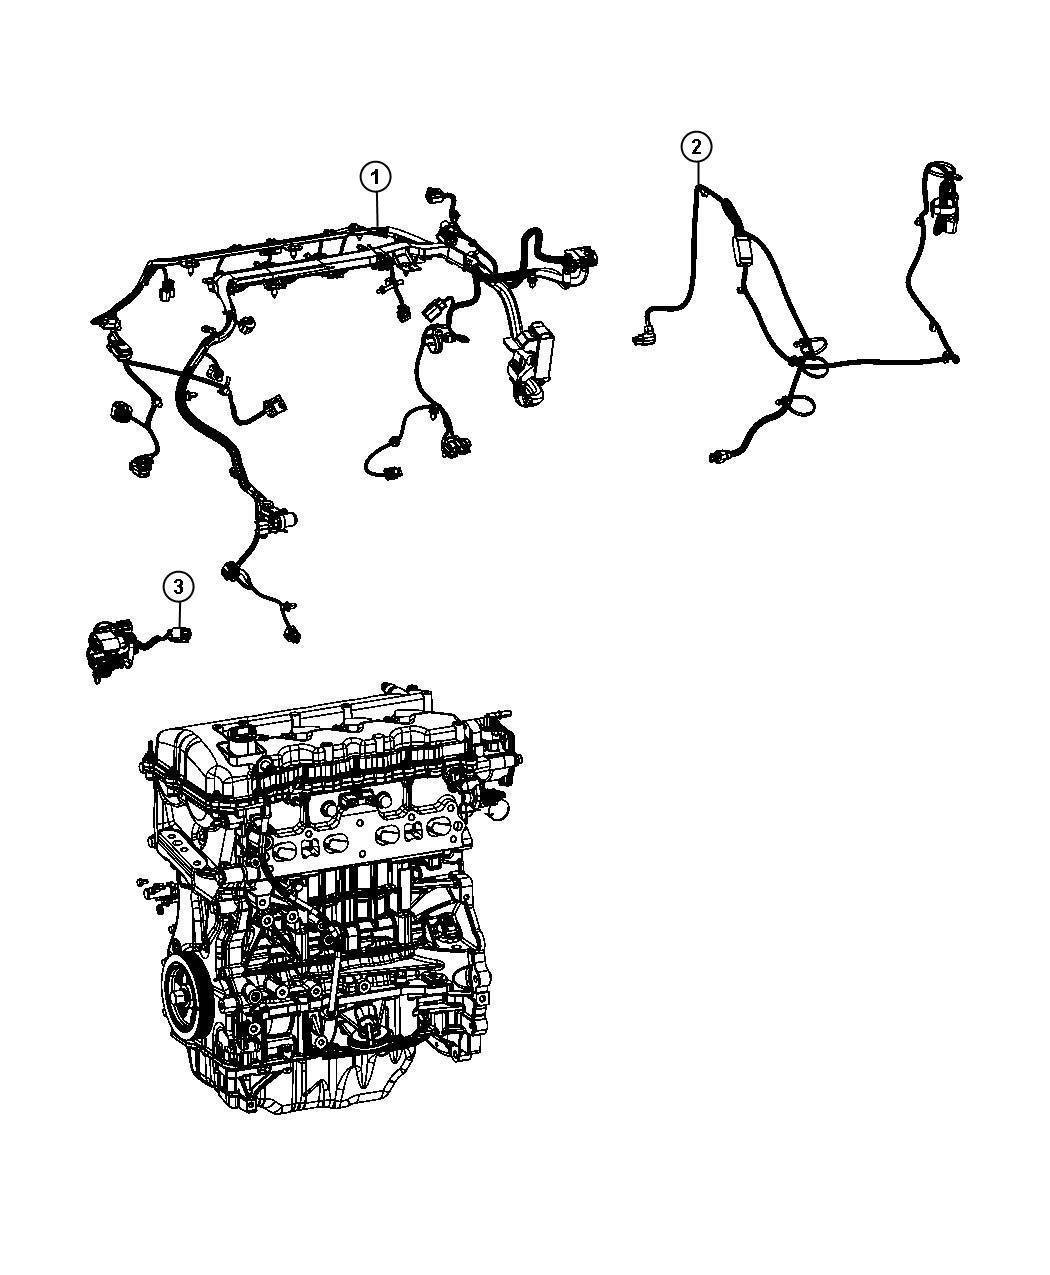 Dodge Dart Wiring. Jumper. Electric power steering